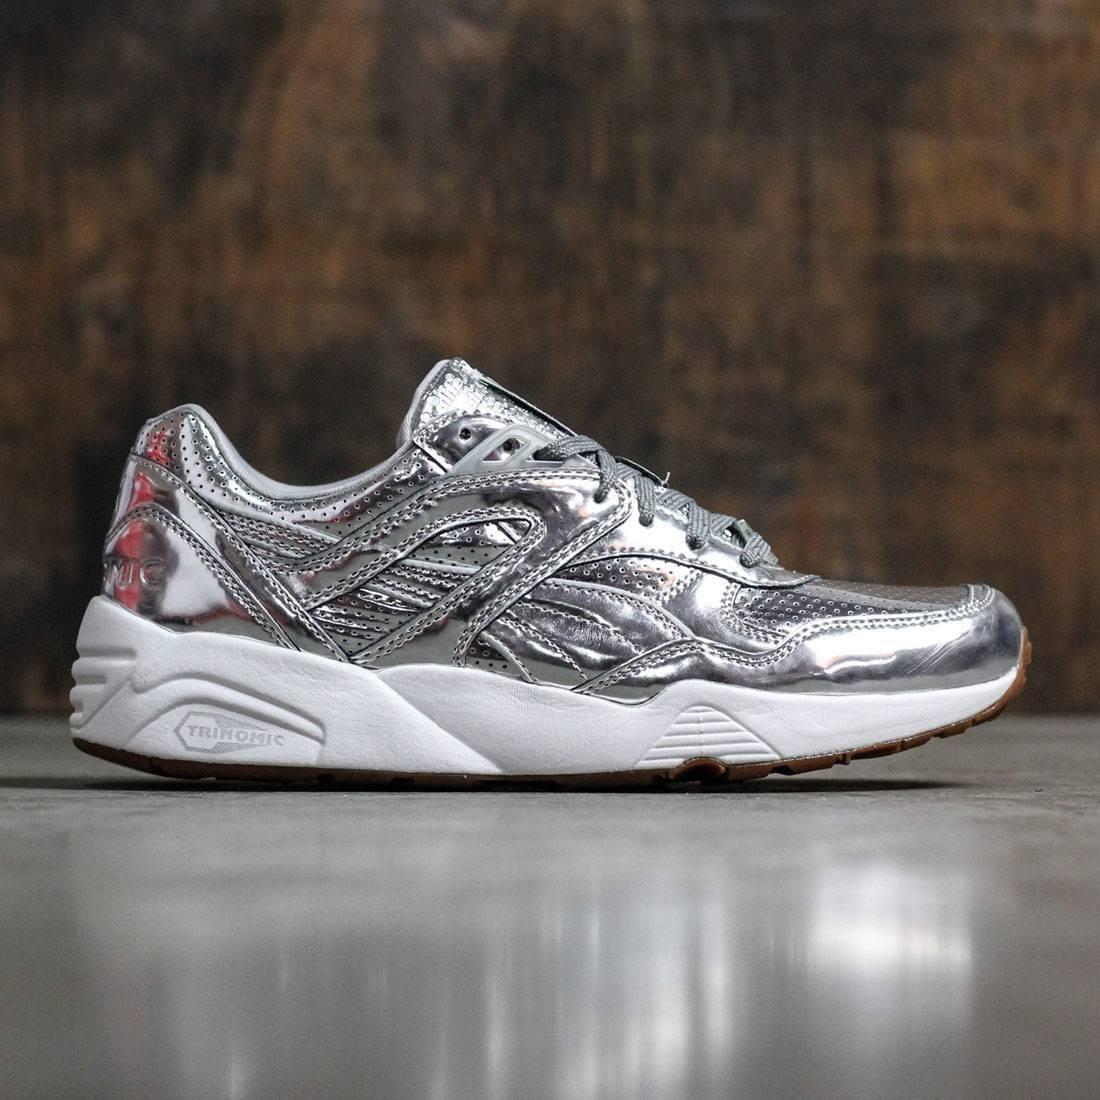 Puma x ALIFE Men R698 Trinomic (silver / white)